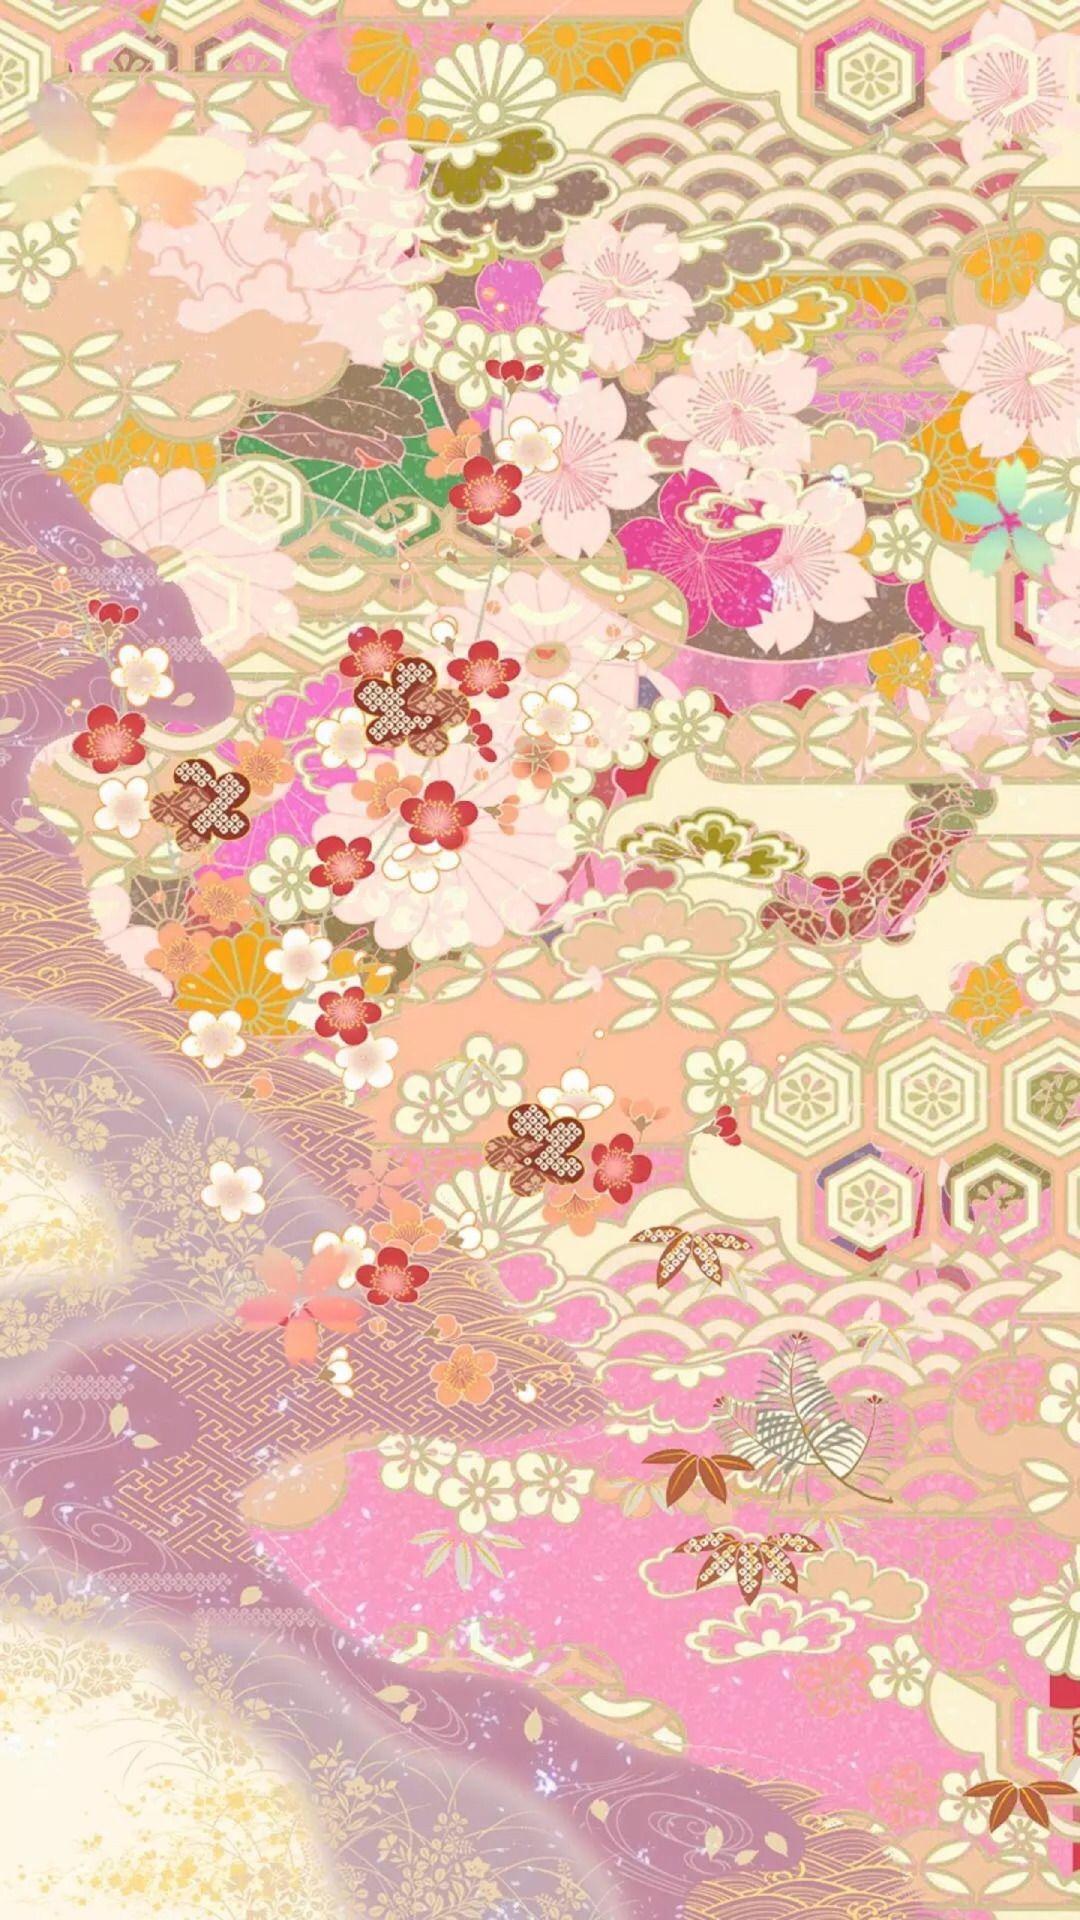 Iphone Wallpapers Vintage Asian Art Japanese Art Japanese Patterns